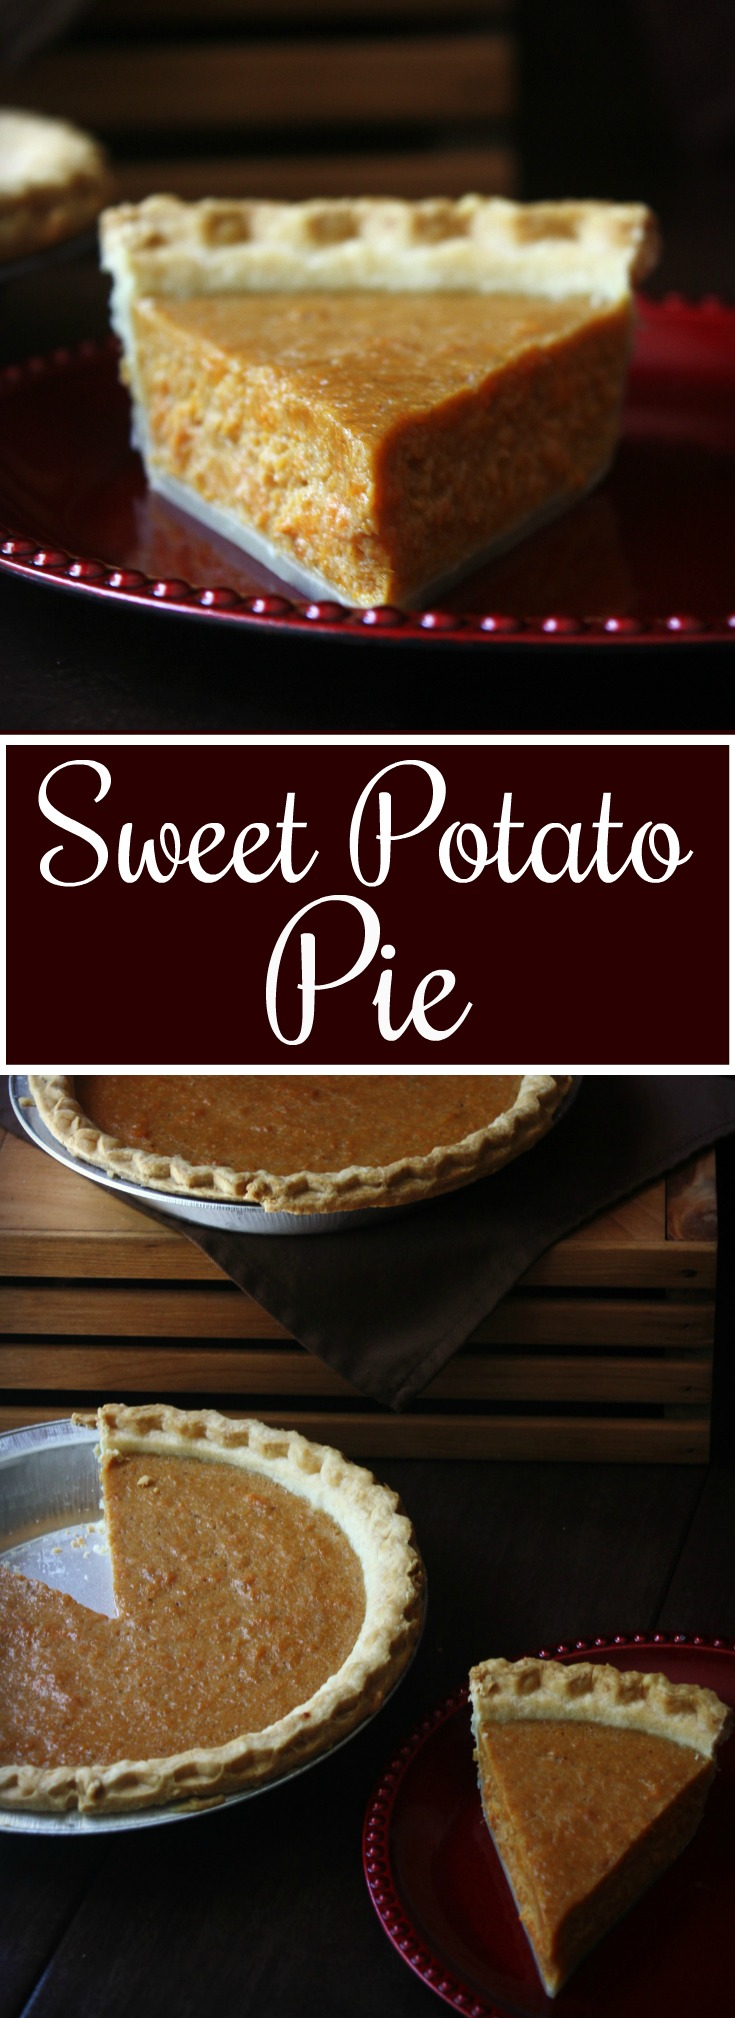 Sweet Potato Pie. My favorite Thanksgiving Pie